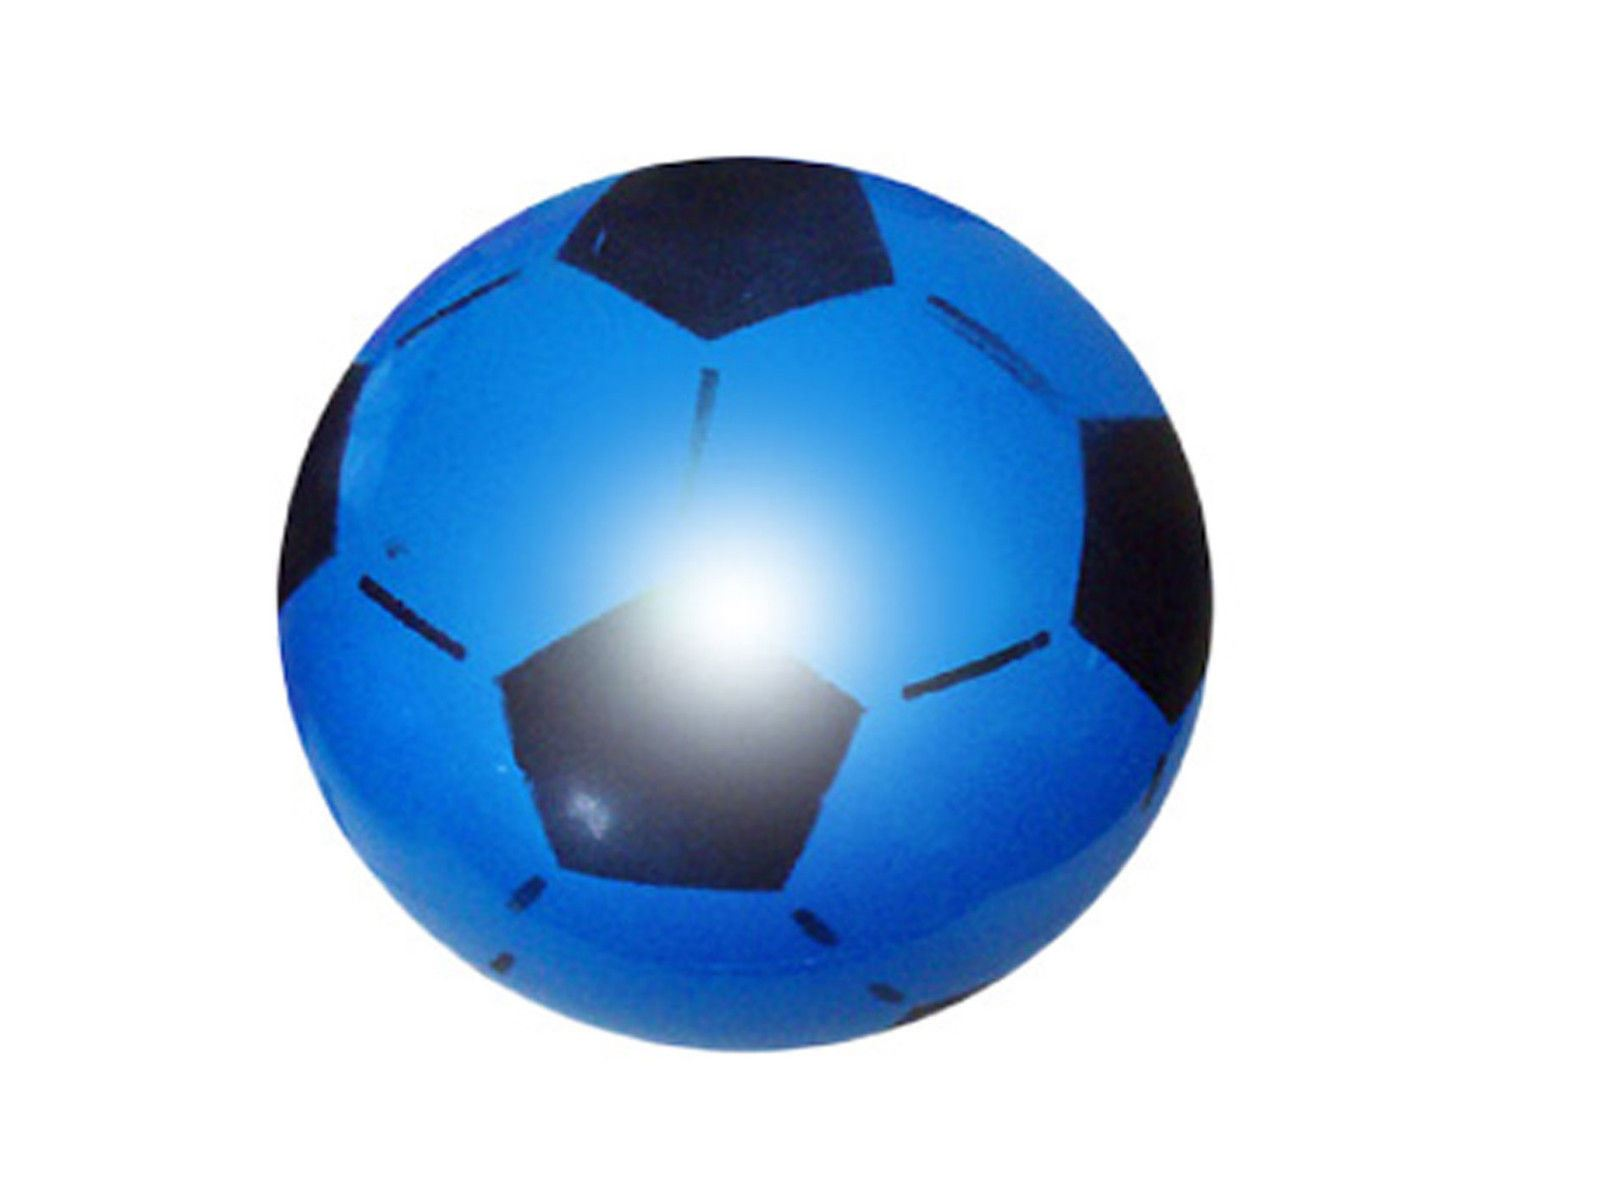 Blue PVC Football